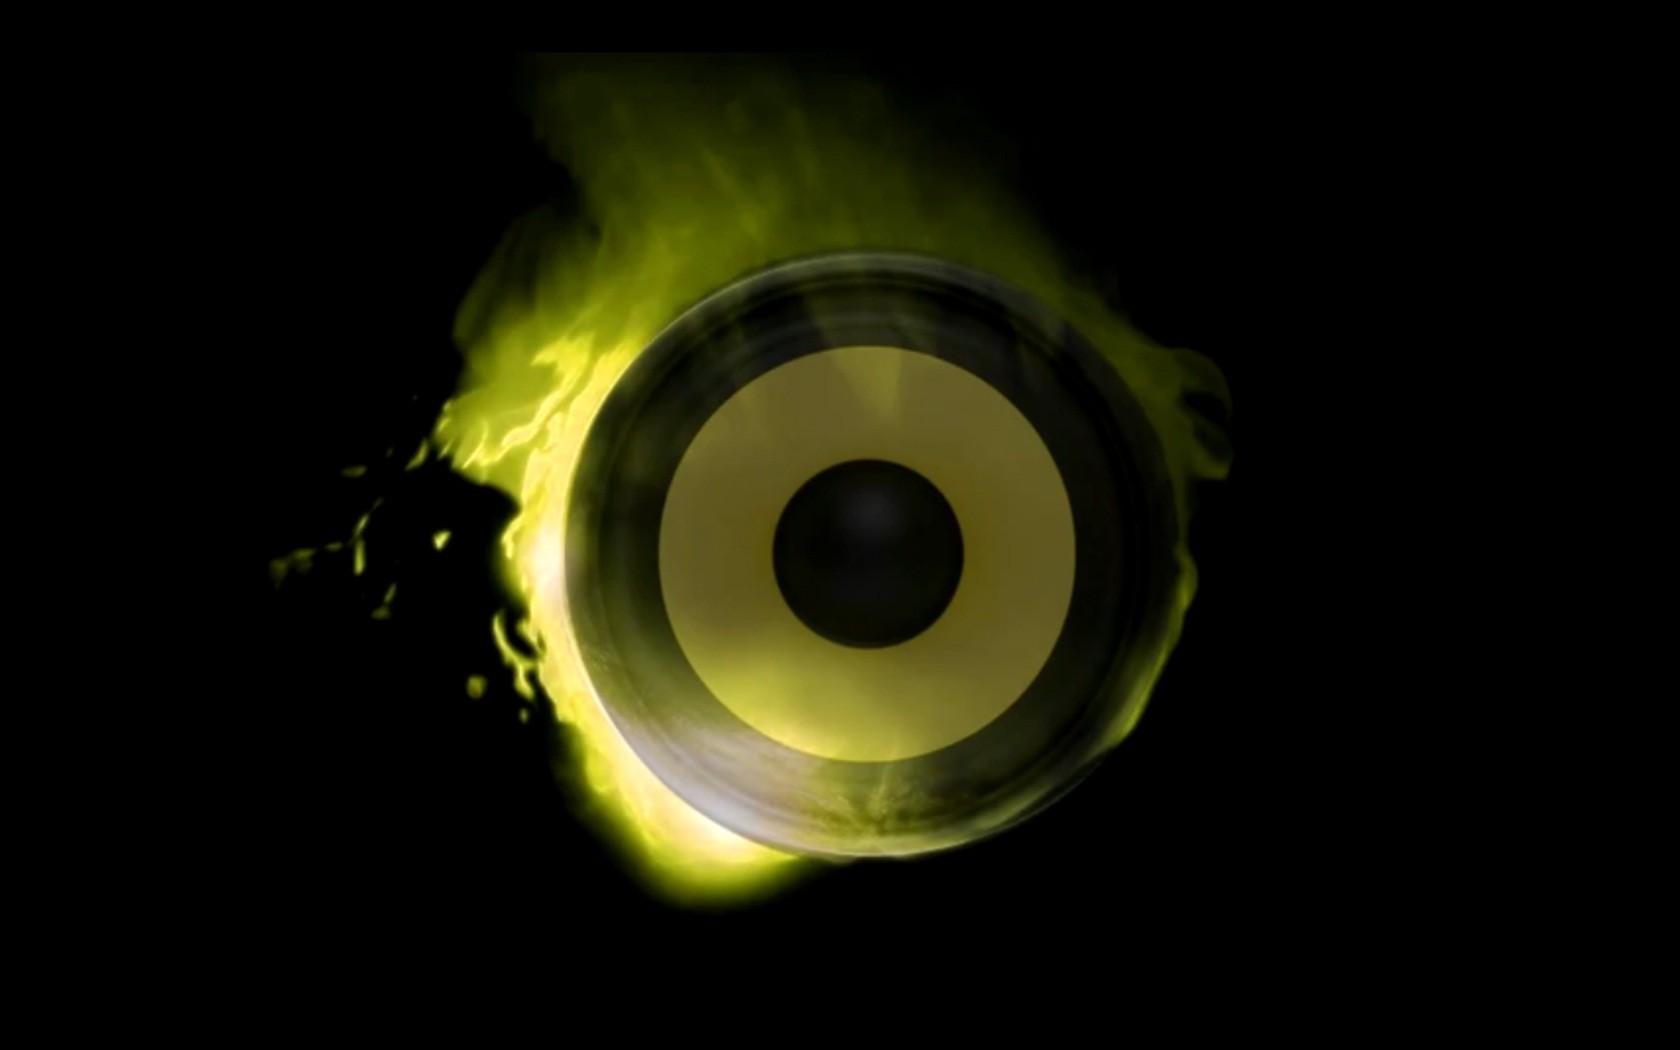 Wonderful Wallpaper Music Bass - music-green-circle-life-speakers-Aimp-UKF-Drum-and-Bass-light-eye-lighting-wheel-darkness-computer-wallpaper-macro-photography-221891  Snapshot_31770.jpg